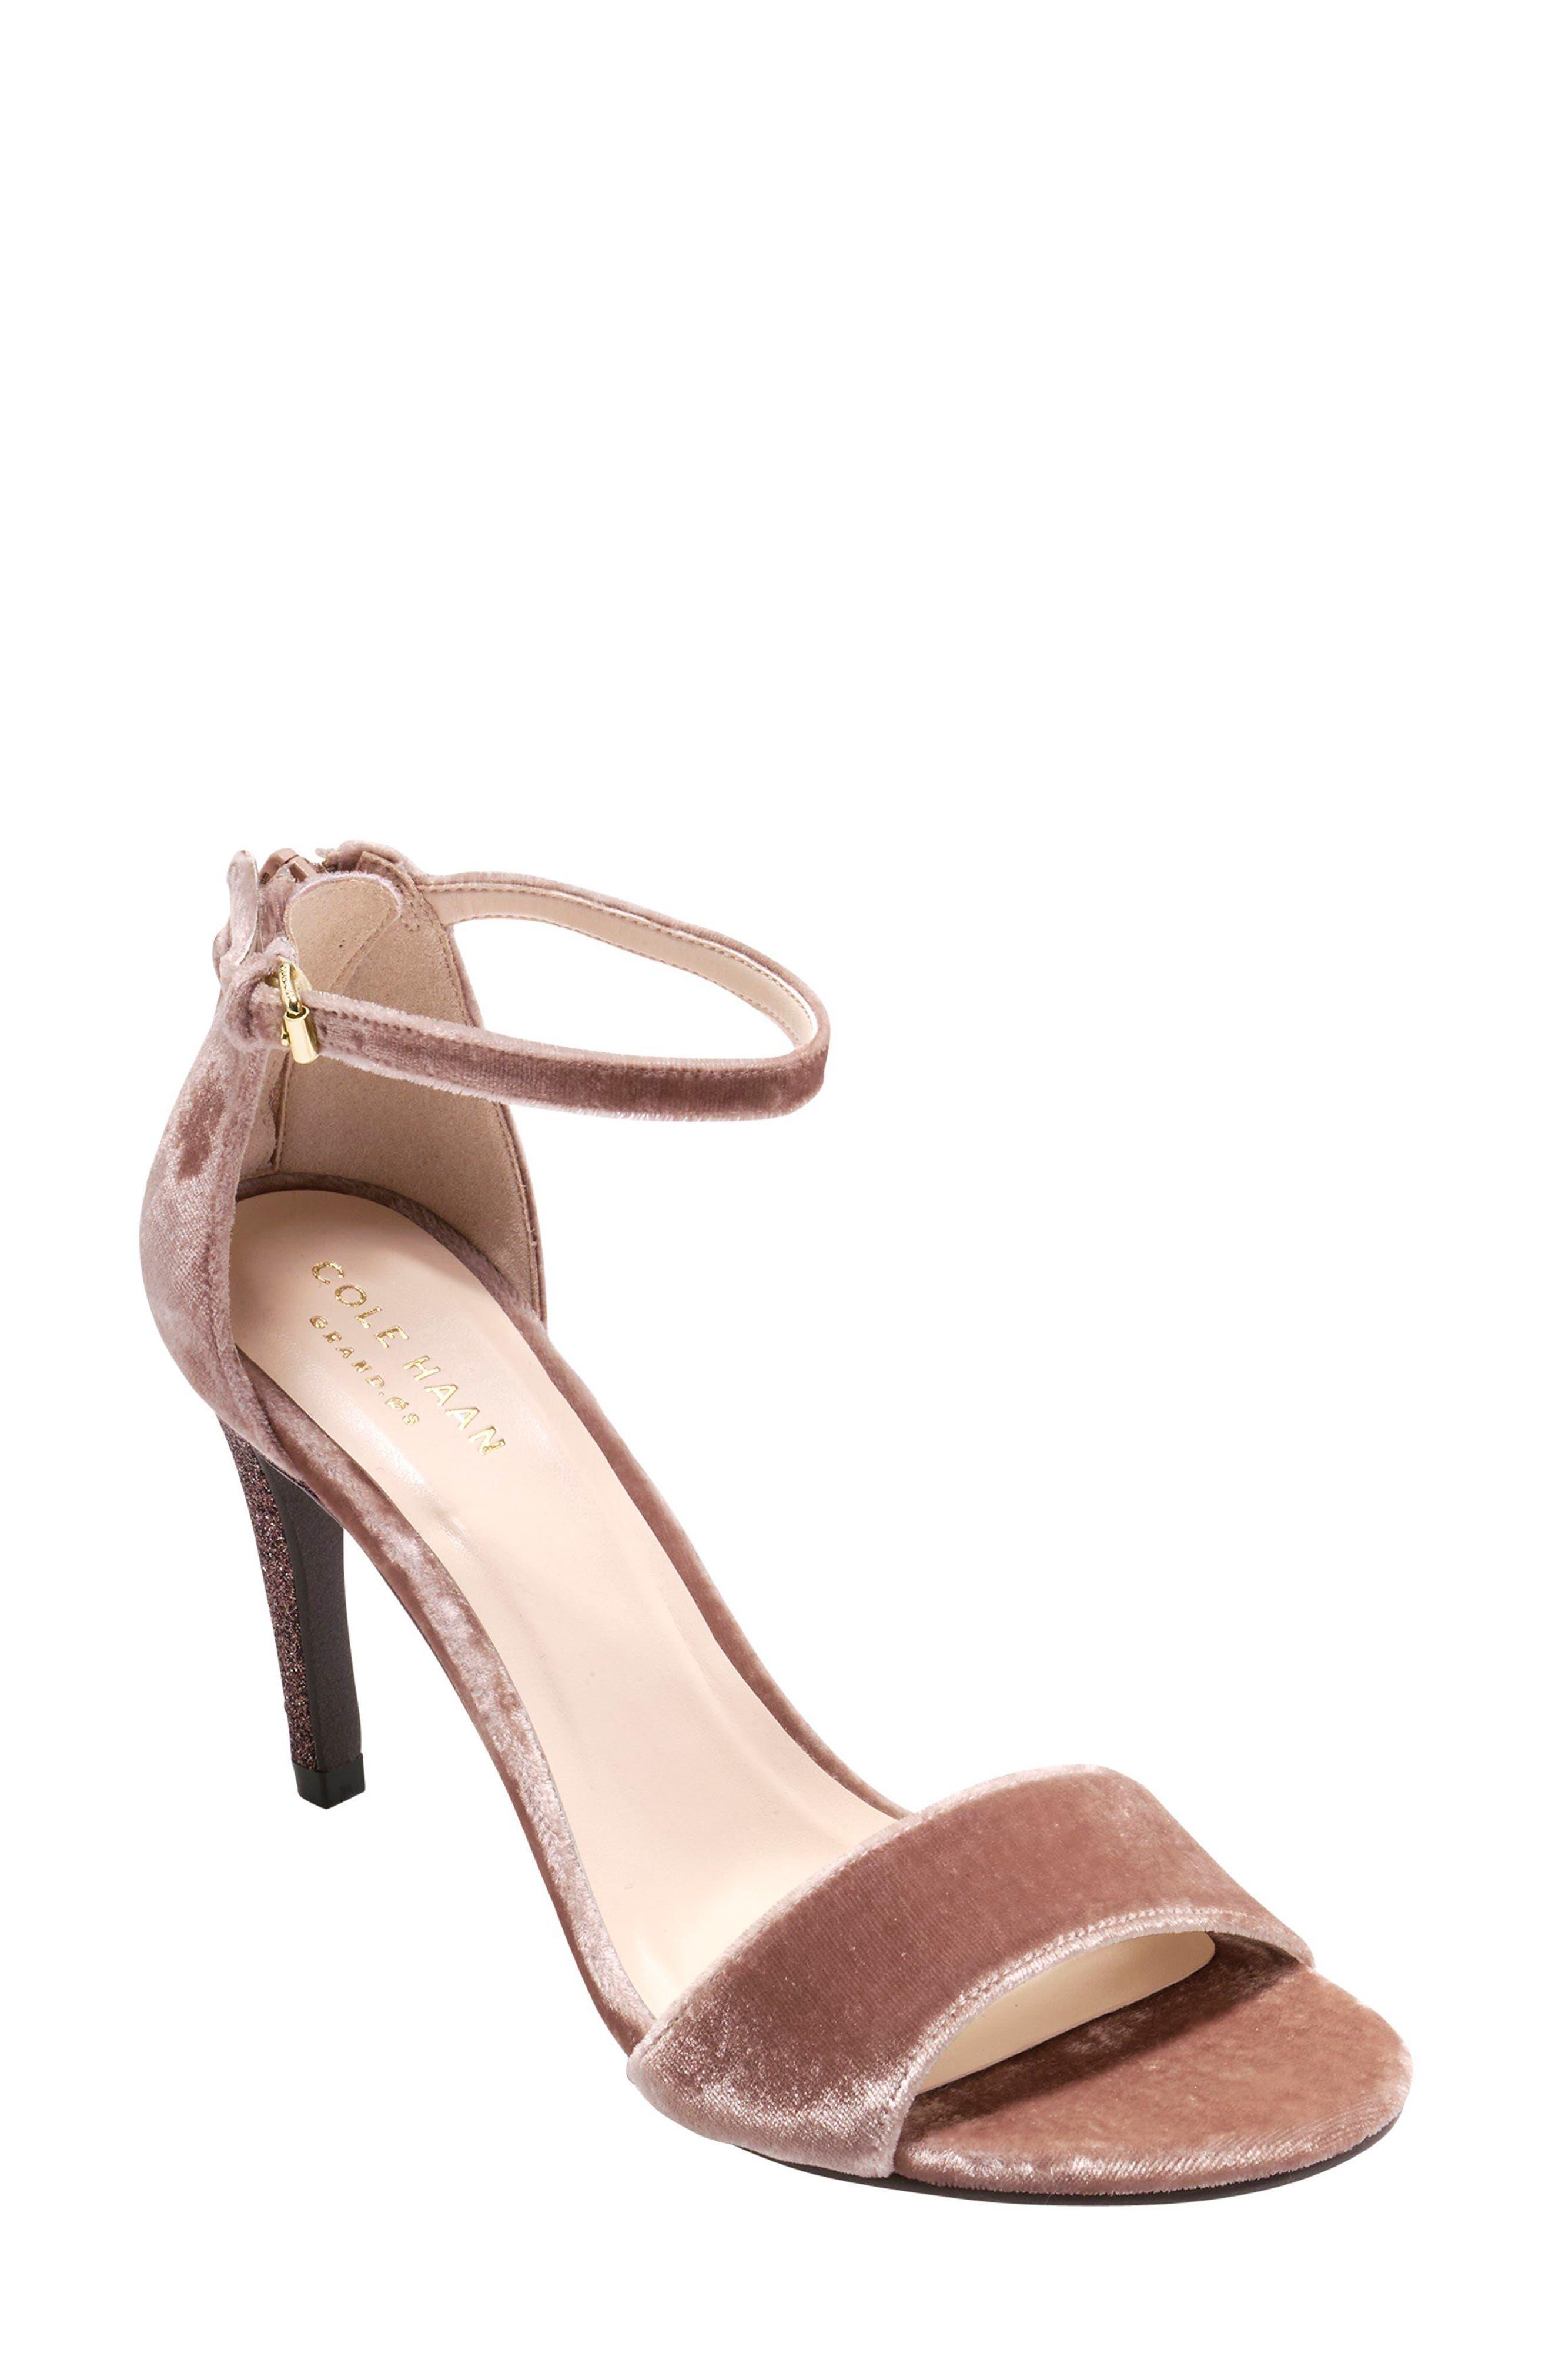 Clara Grand Ankle Strap Sandal,                         Main,                         color, Nude Velvet